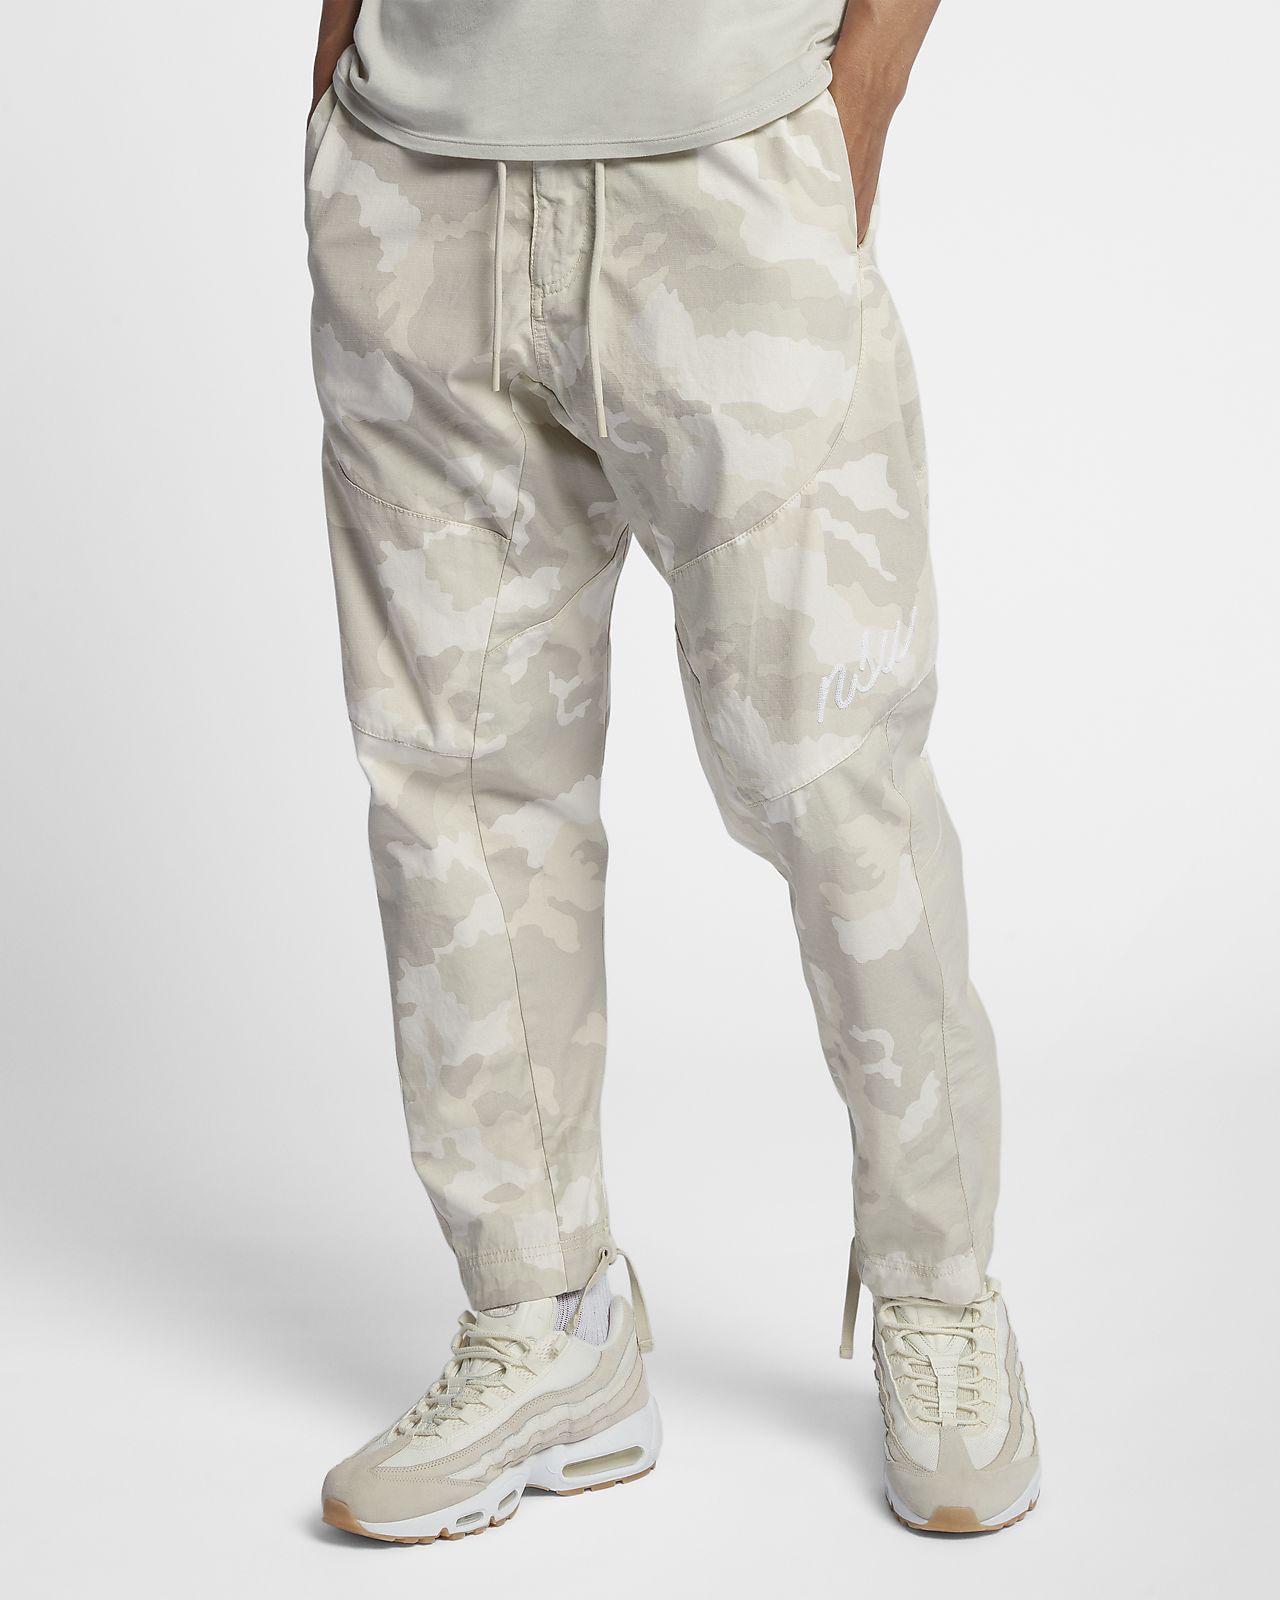 Nike Sportswear NSW 男款迷彩休閒褲